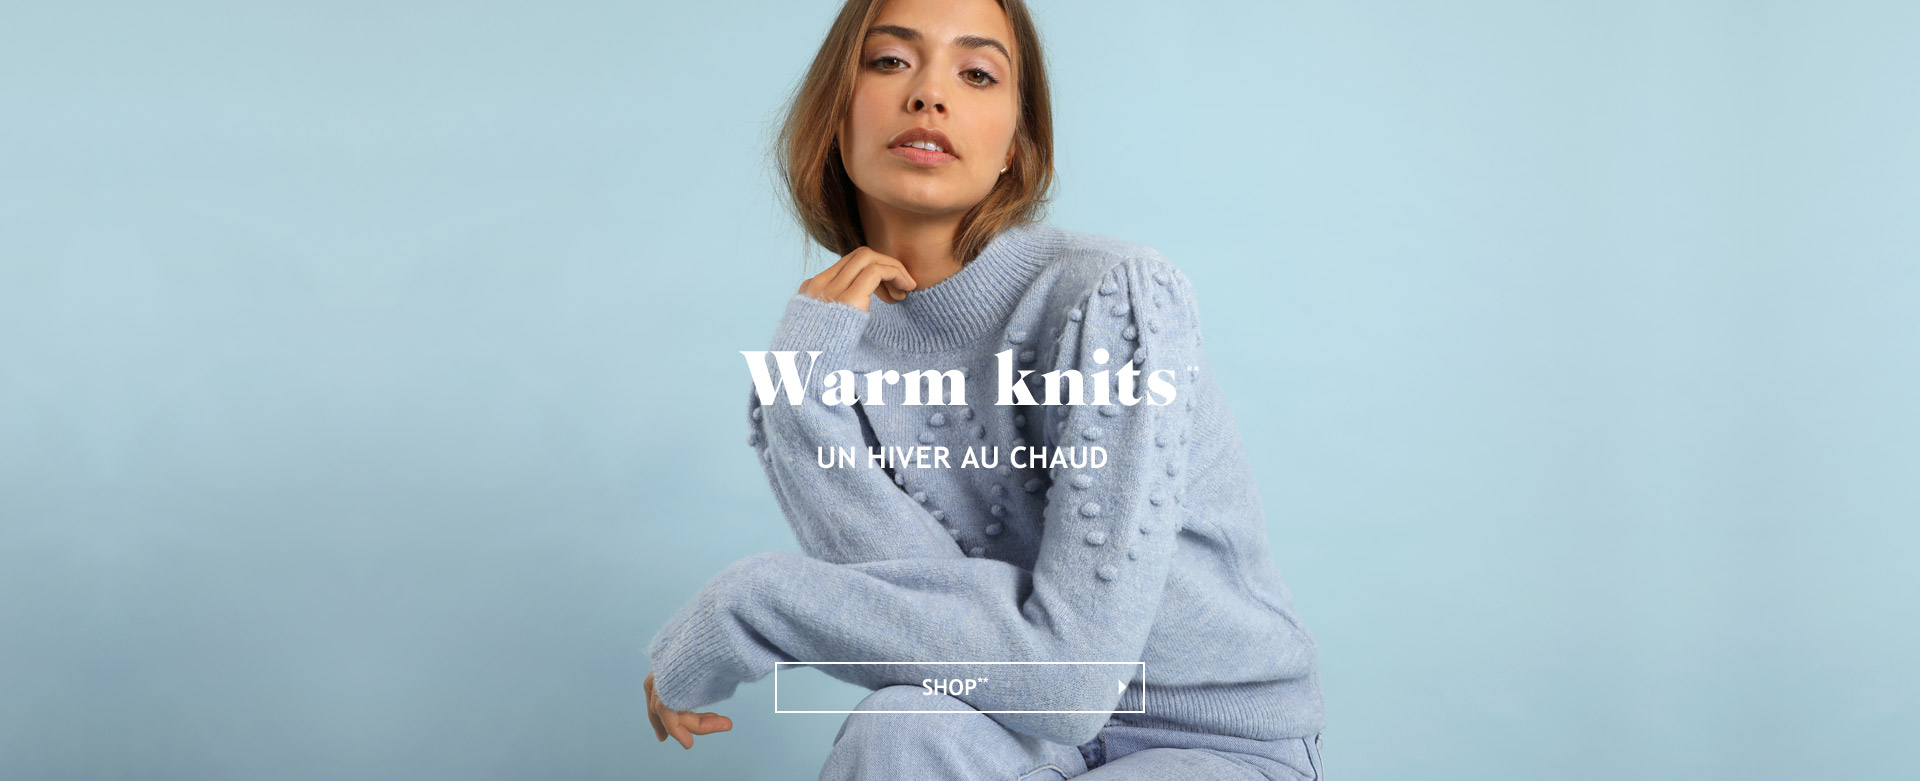 Warm knits**